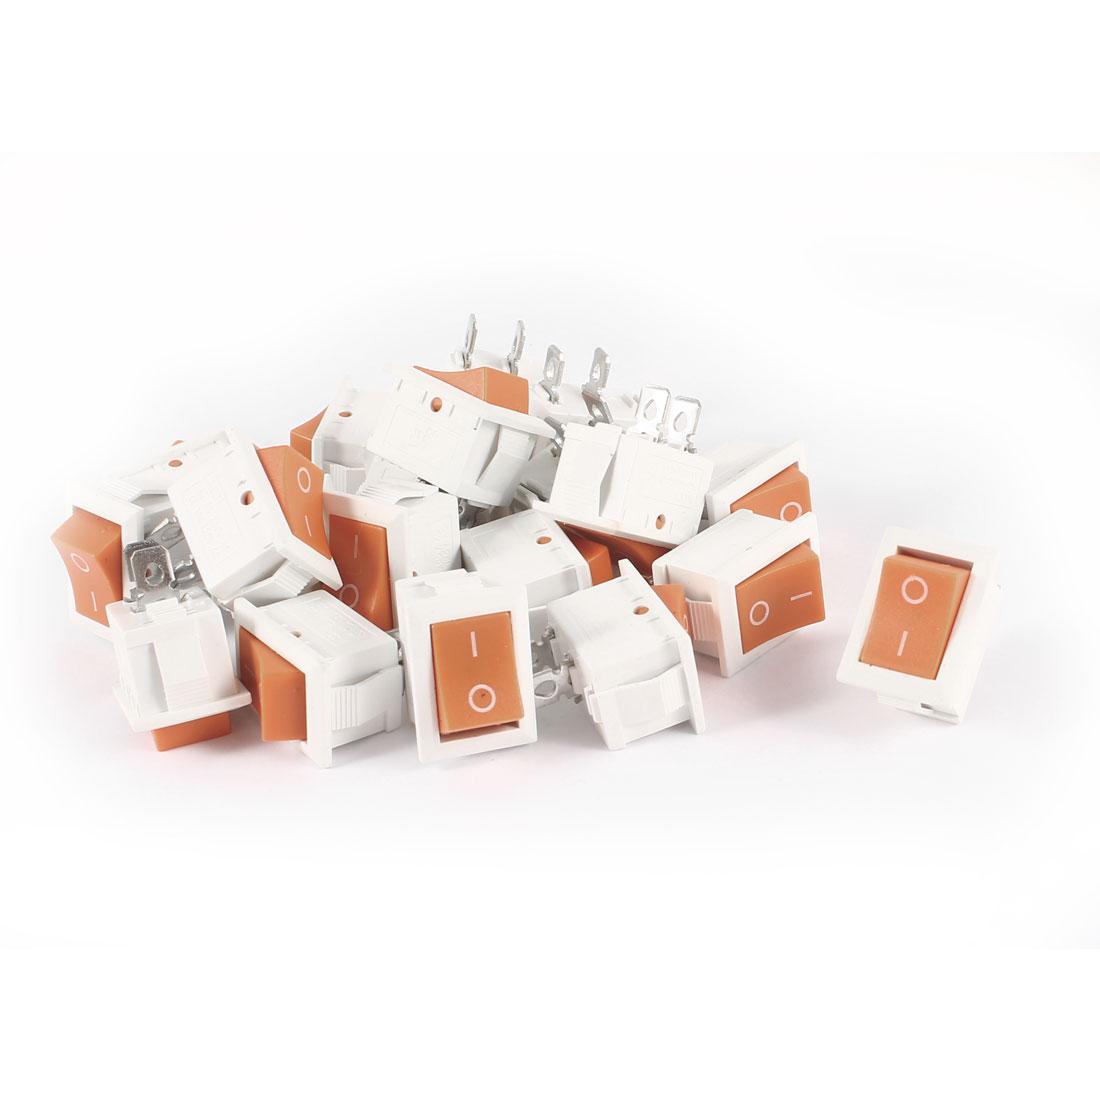 20 Pcs KCD1 AC 250V 6A 125V 10A 2Pin SPST Power ON/OFF Panel Mount Rocker Switch Orange White